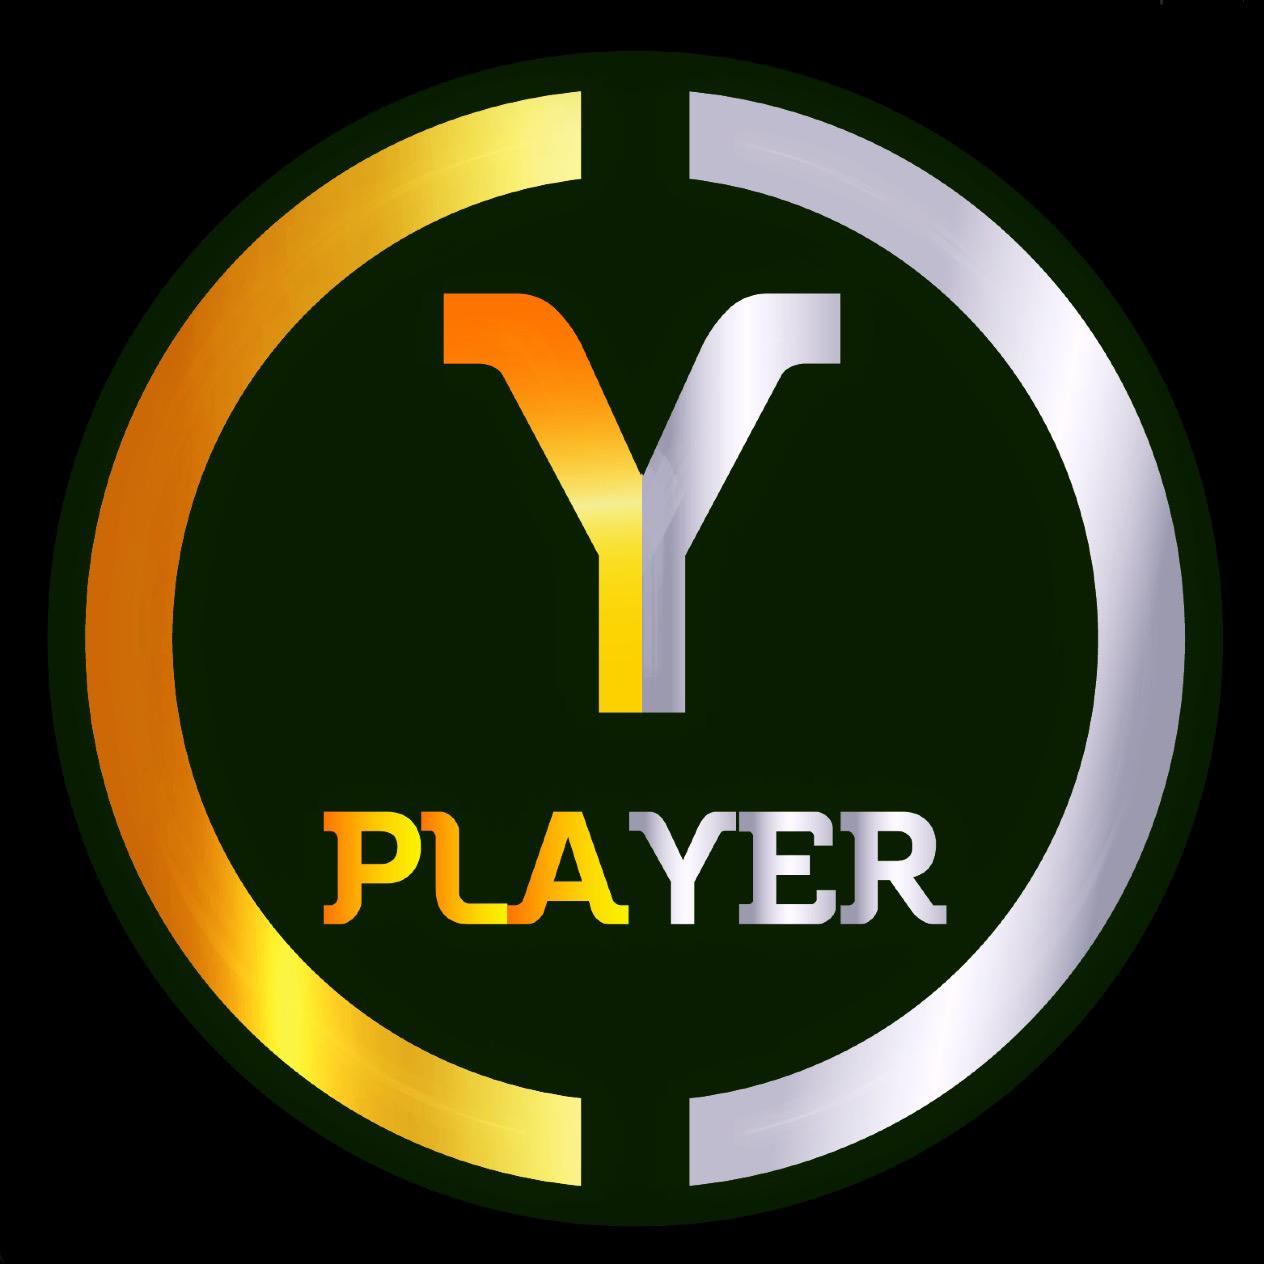 PLAYER - MARCA DE JOGADOR (PLAYER_UNIFORMES) Profile Image   Linktree